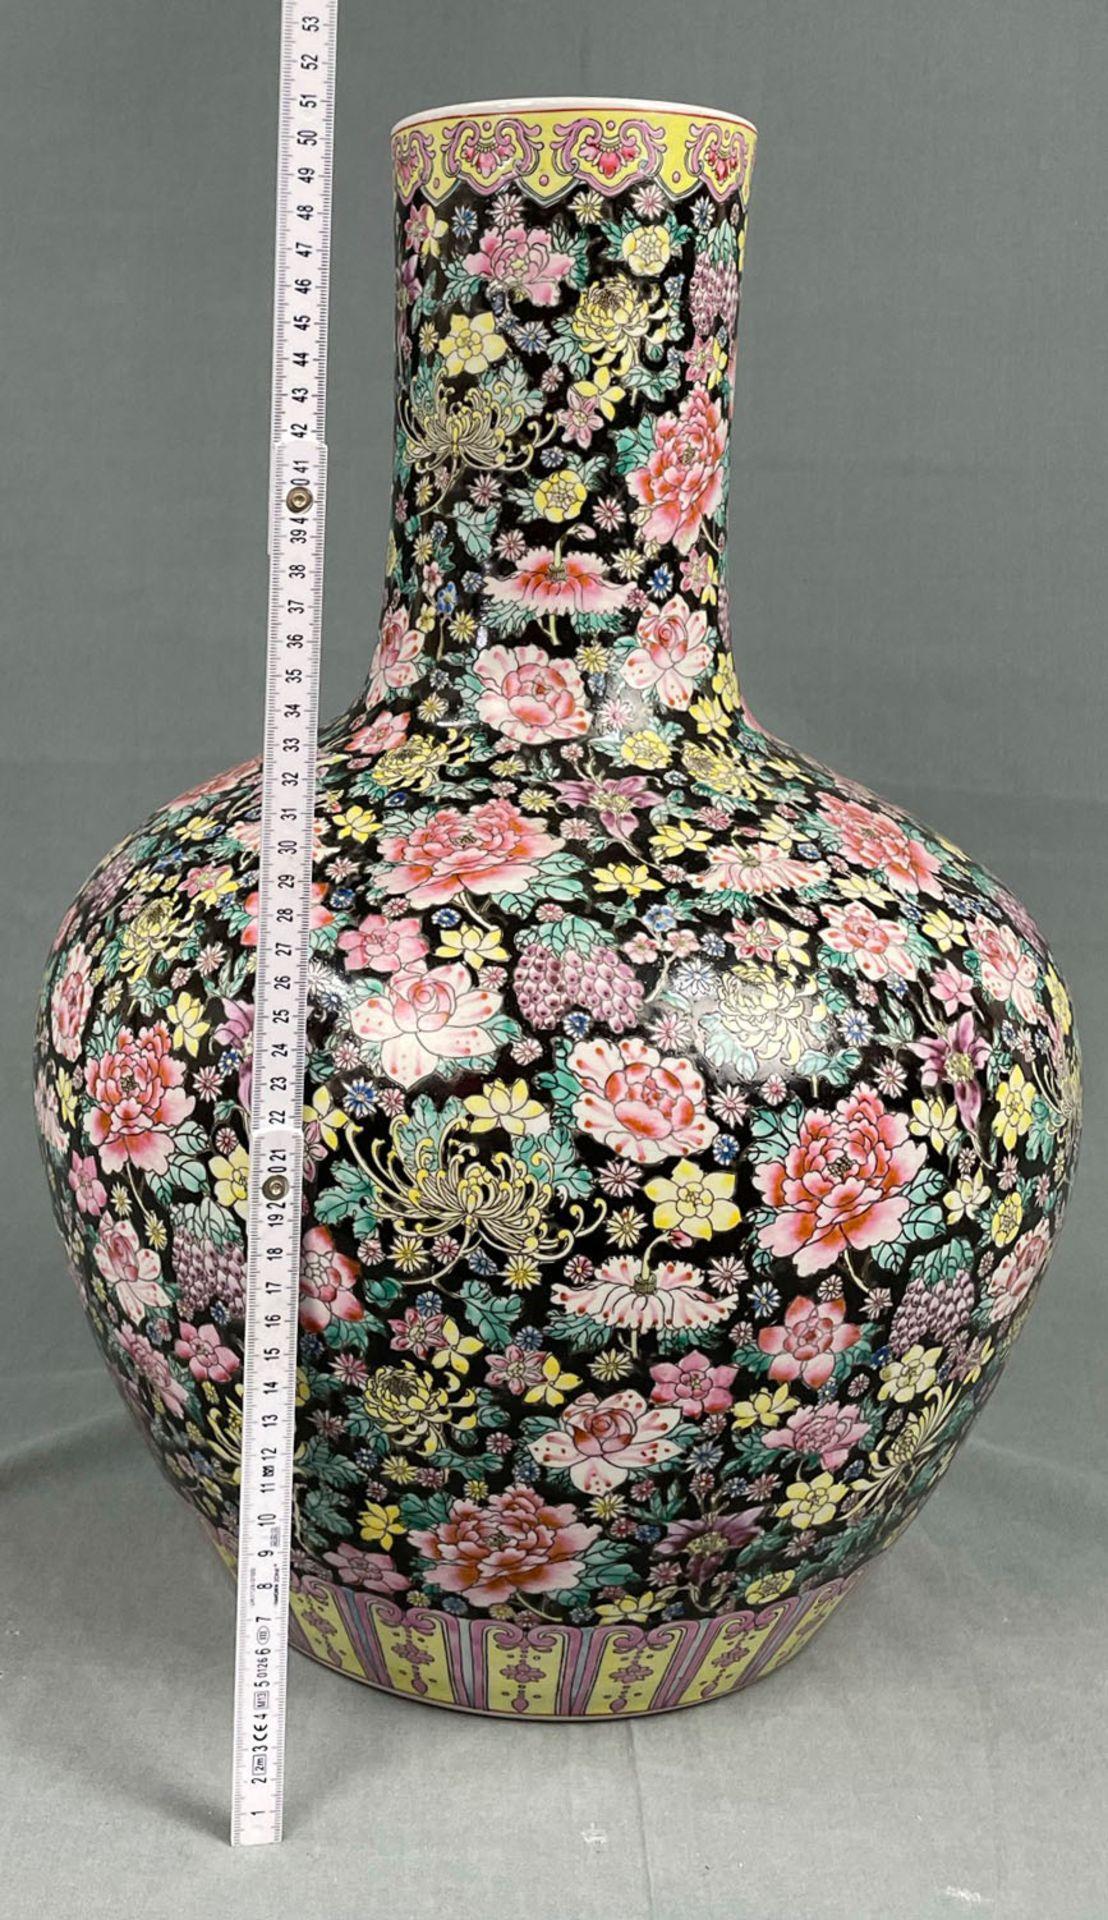 China. Porzellan. Vase. Stempelmarke circa 1930 - 1950. 53 cm hoch. - Image 17 of 20